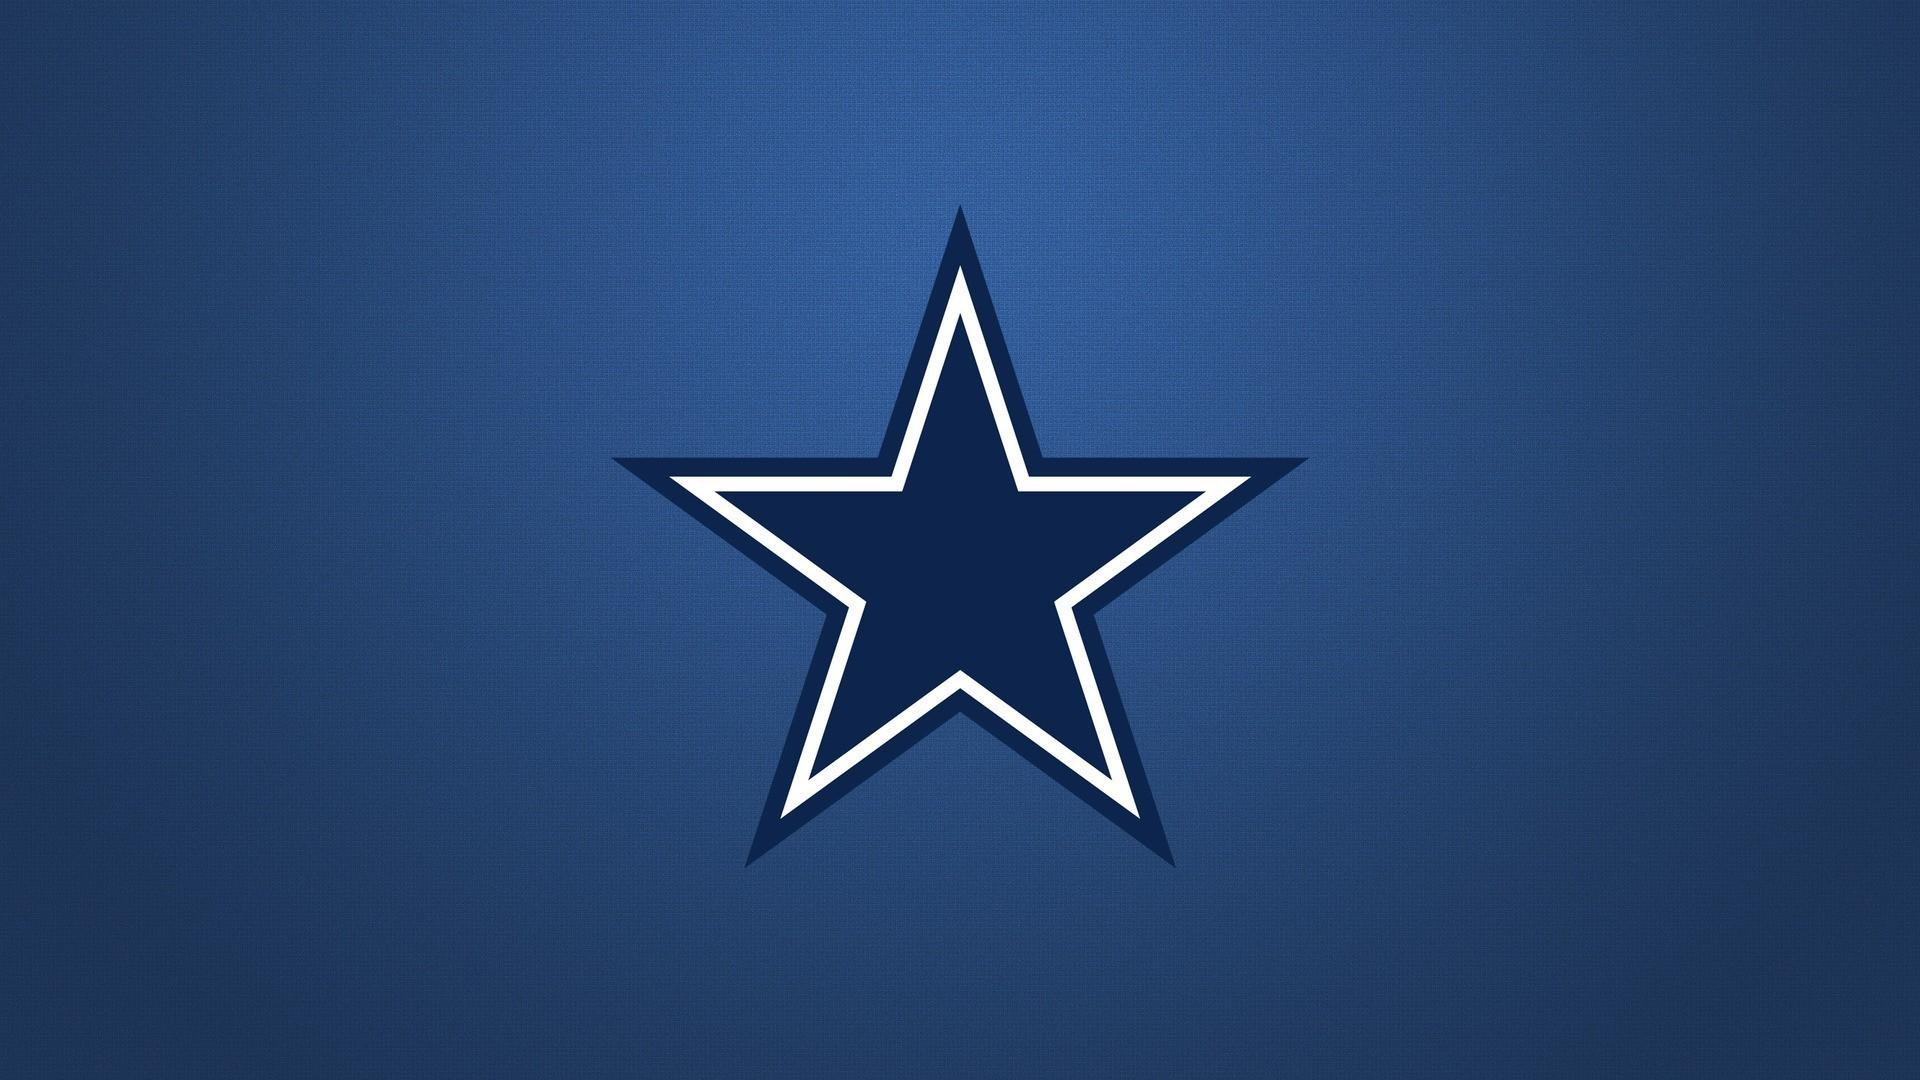 Dallas Cowboys Star Logo Wallpaper